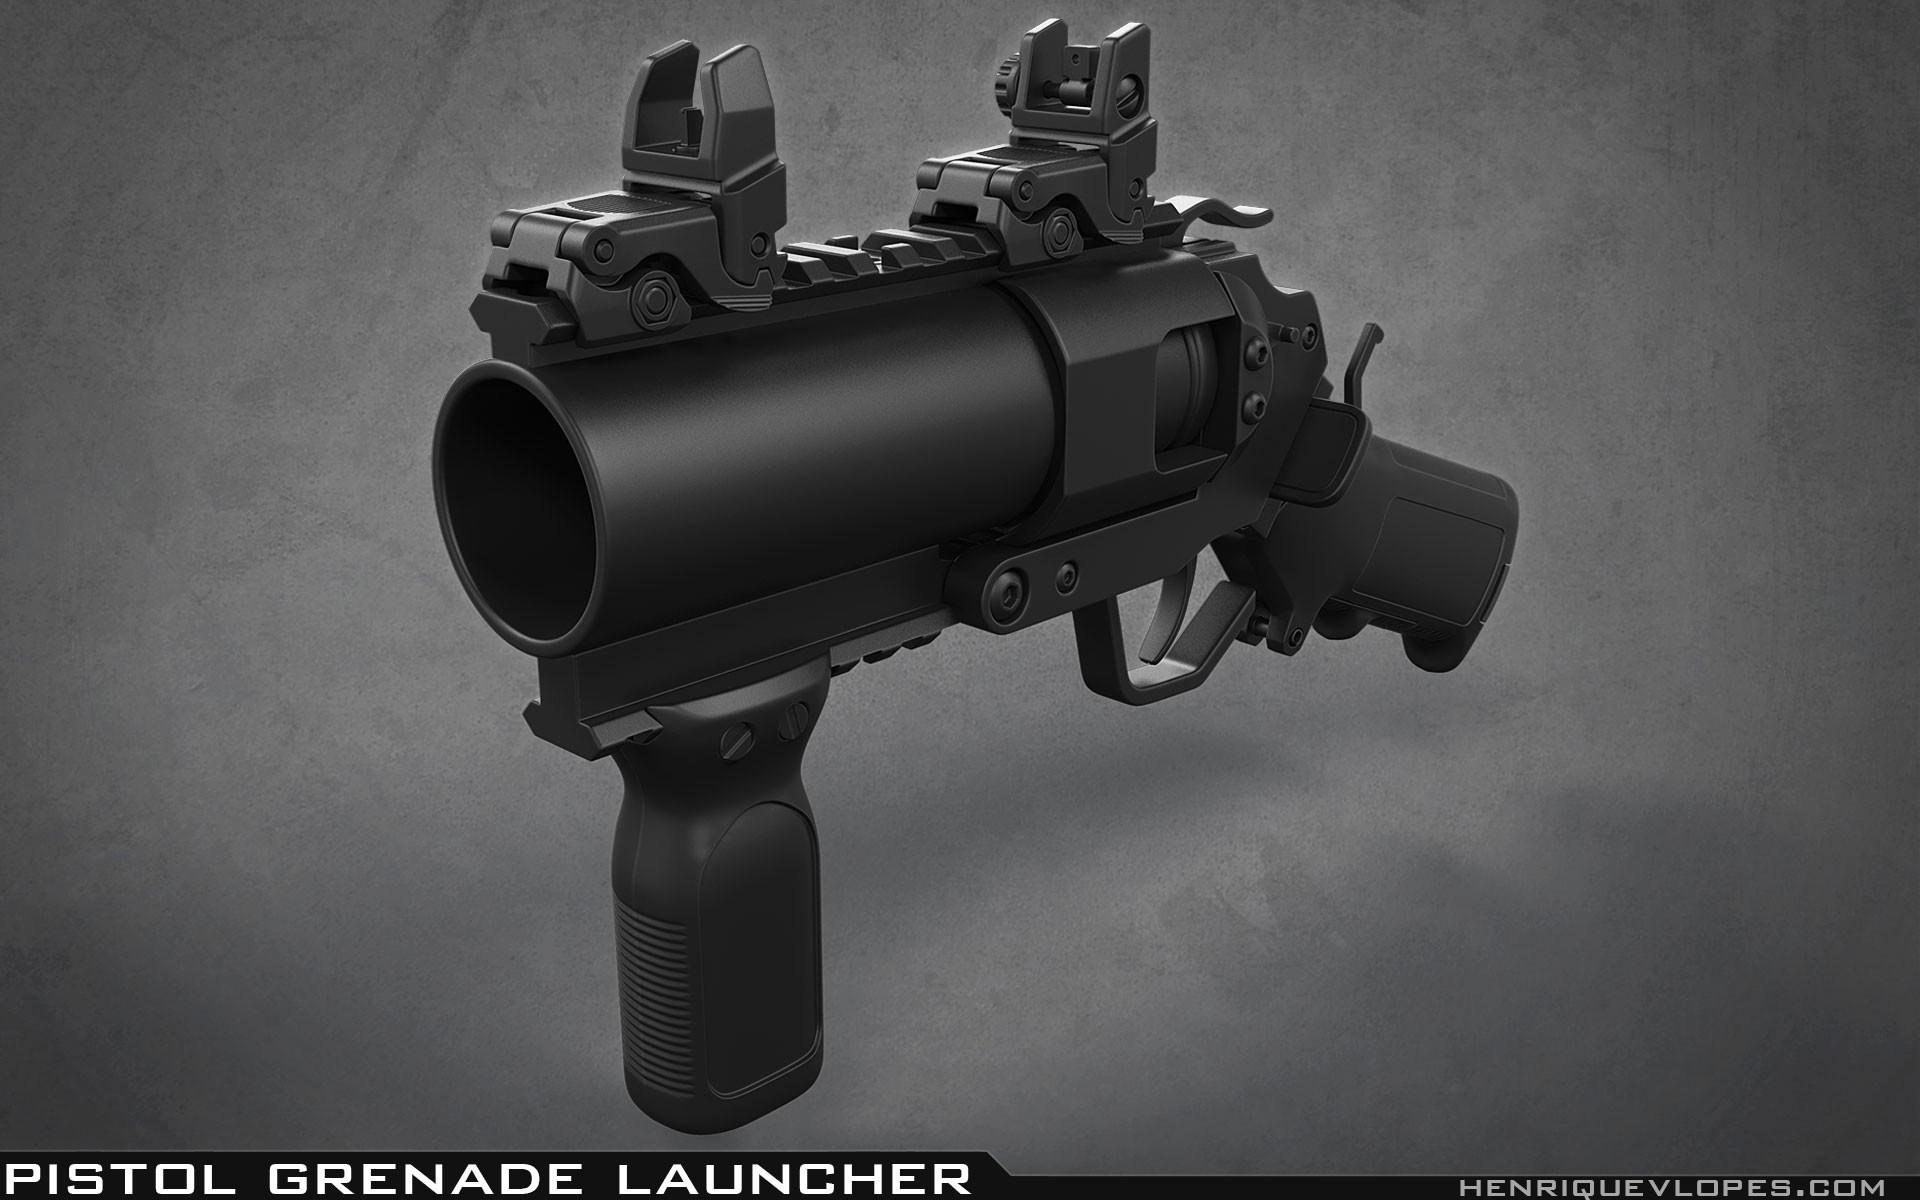 Henrique lopes pistol grenade launcher high 02